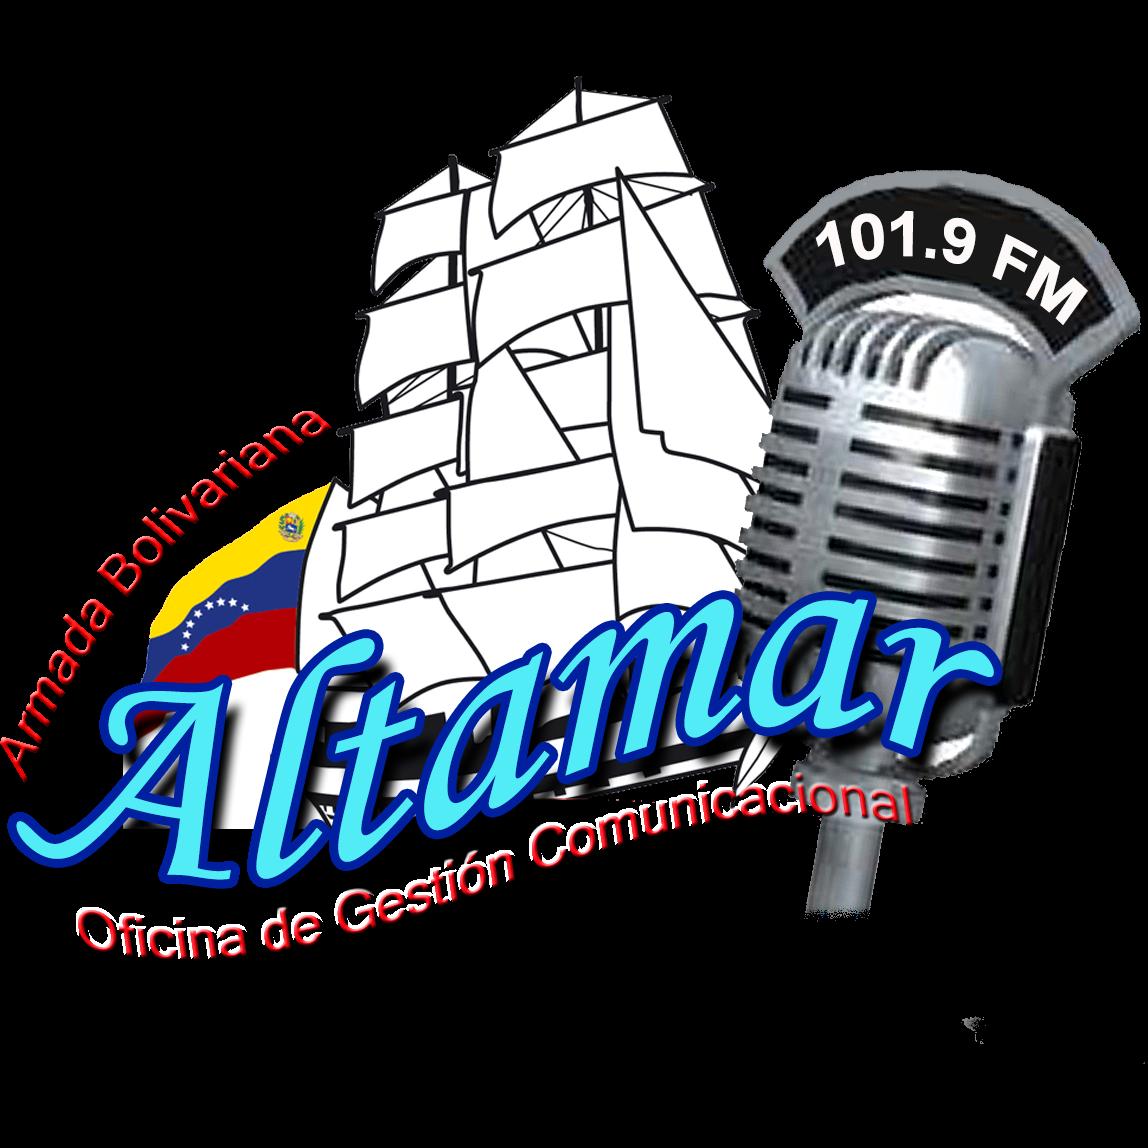 Acuatica RadioOnline